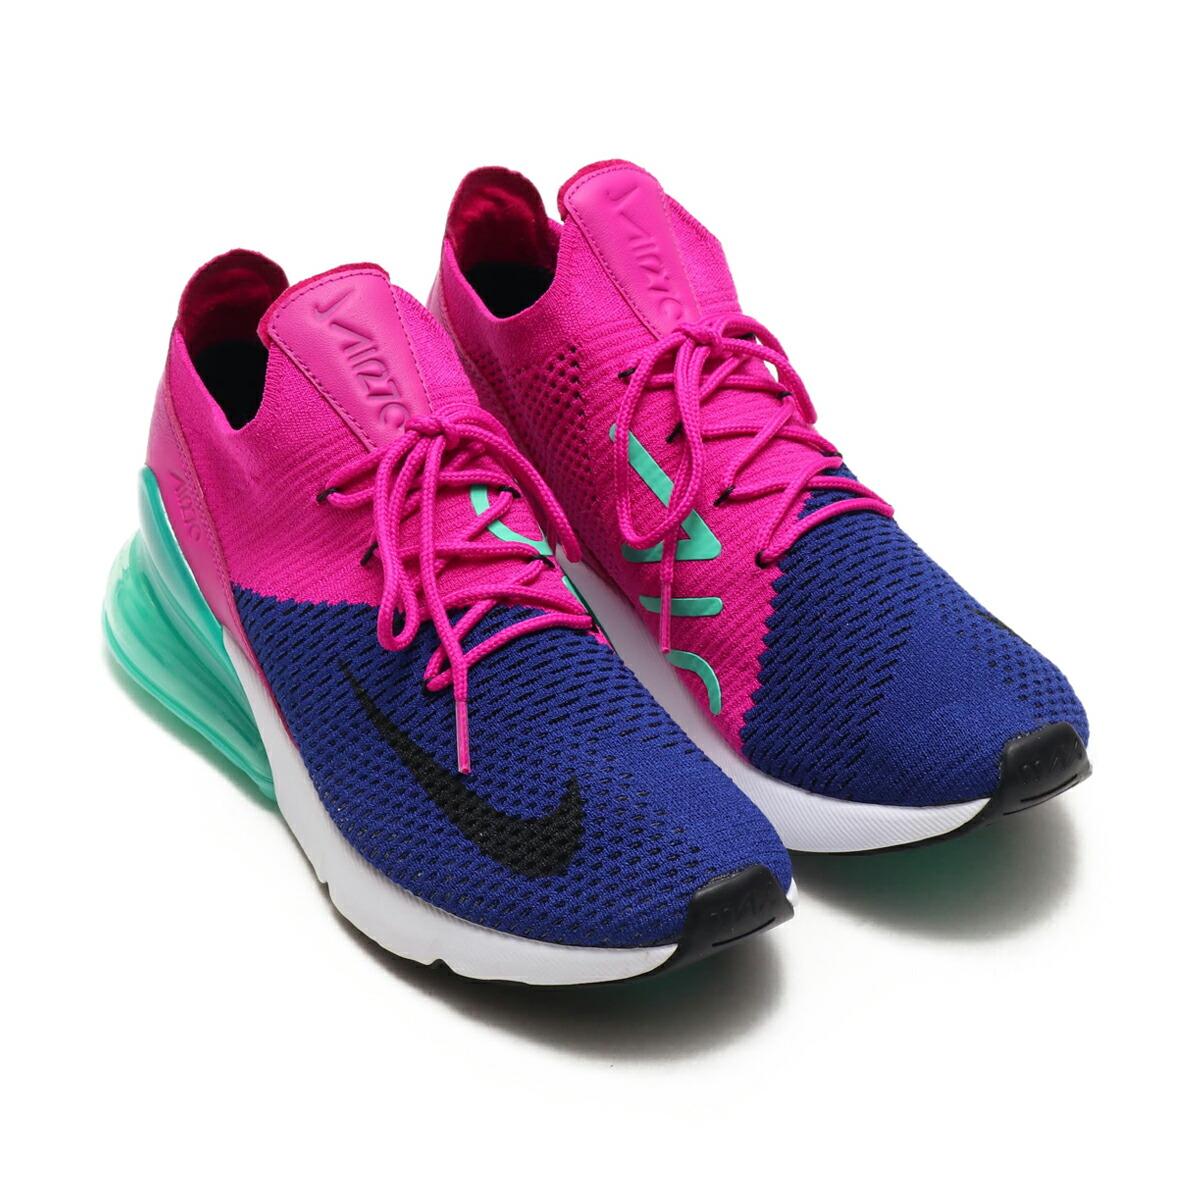 Nike Air Max Guile White Black Pink Royal - Musée des ... 0245beb613488